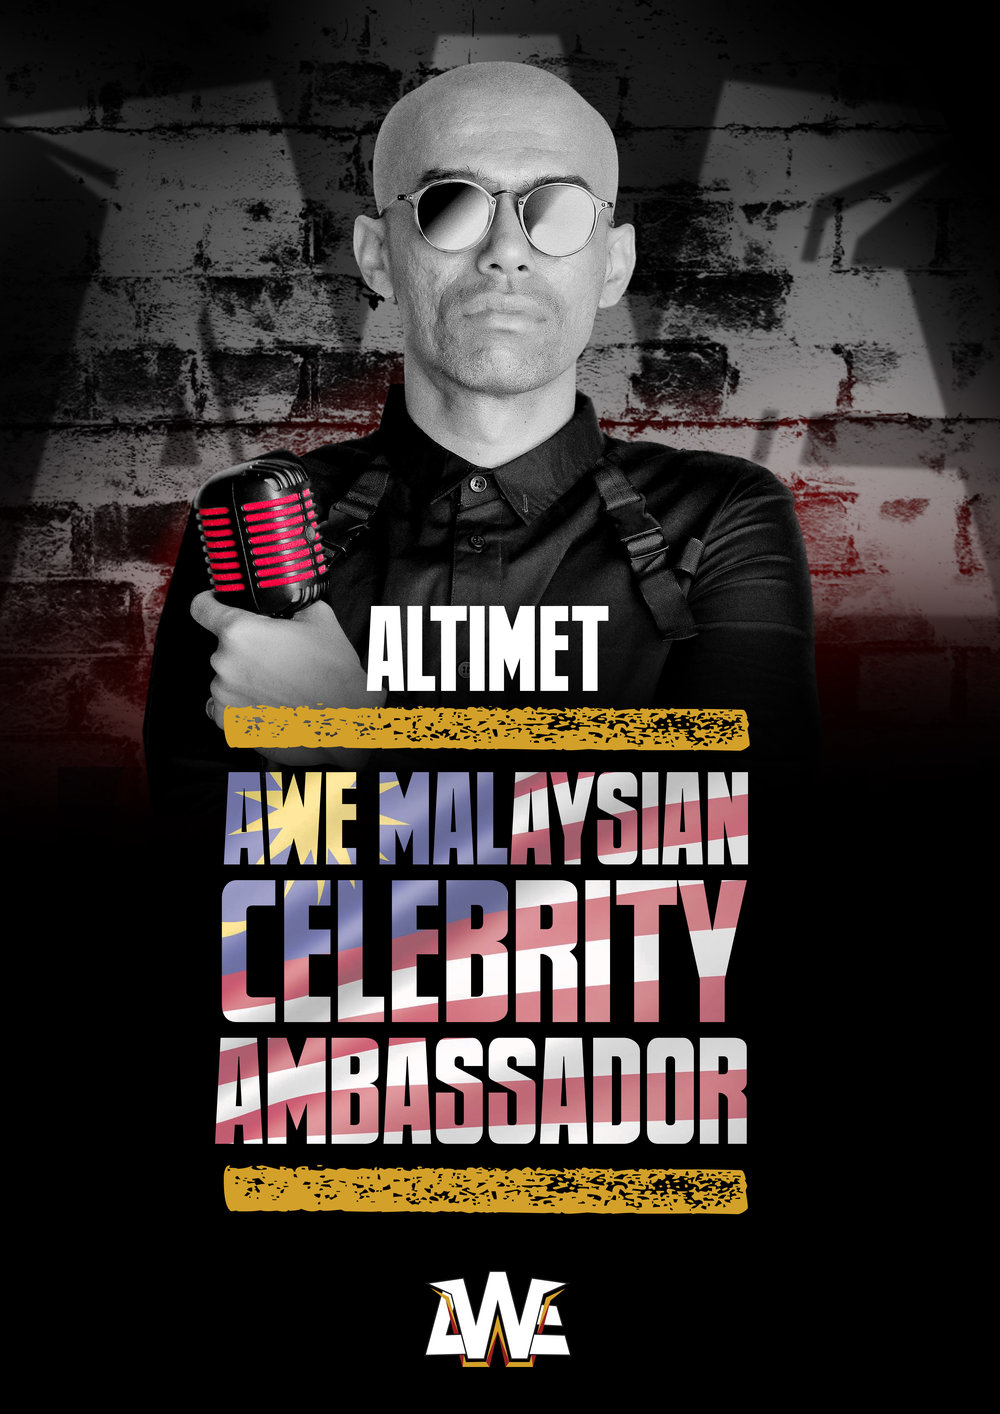 AWE_Altimet_Ambassador.jpg